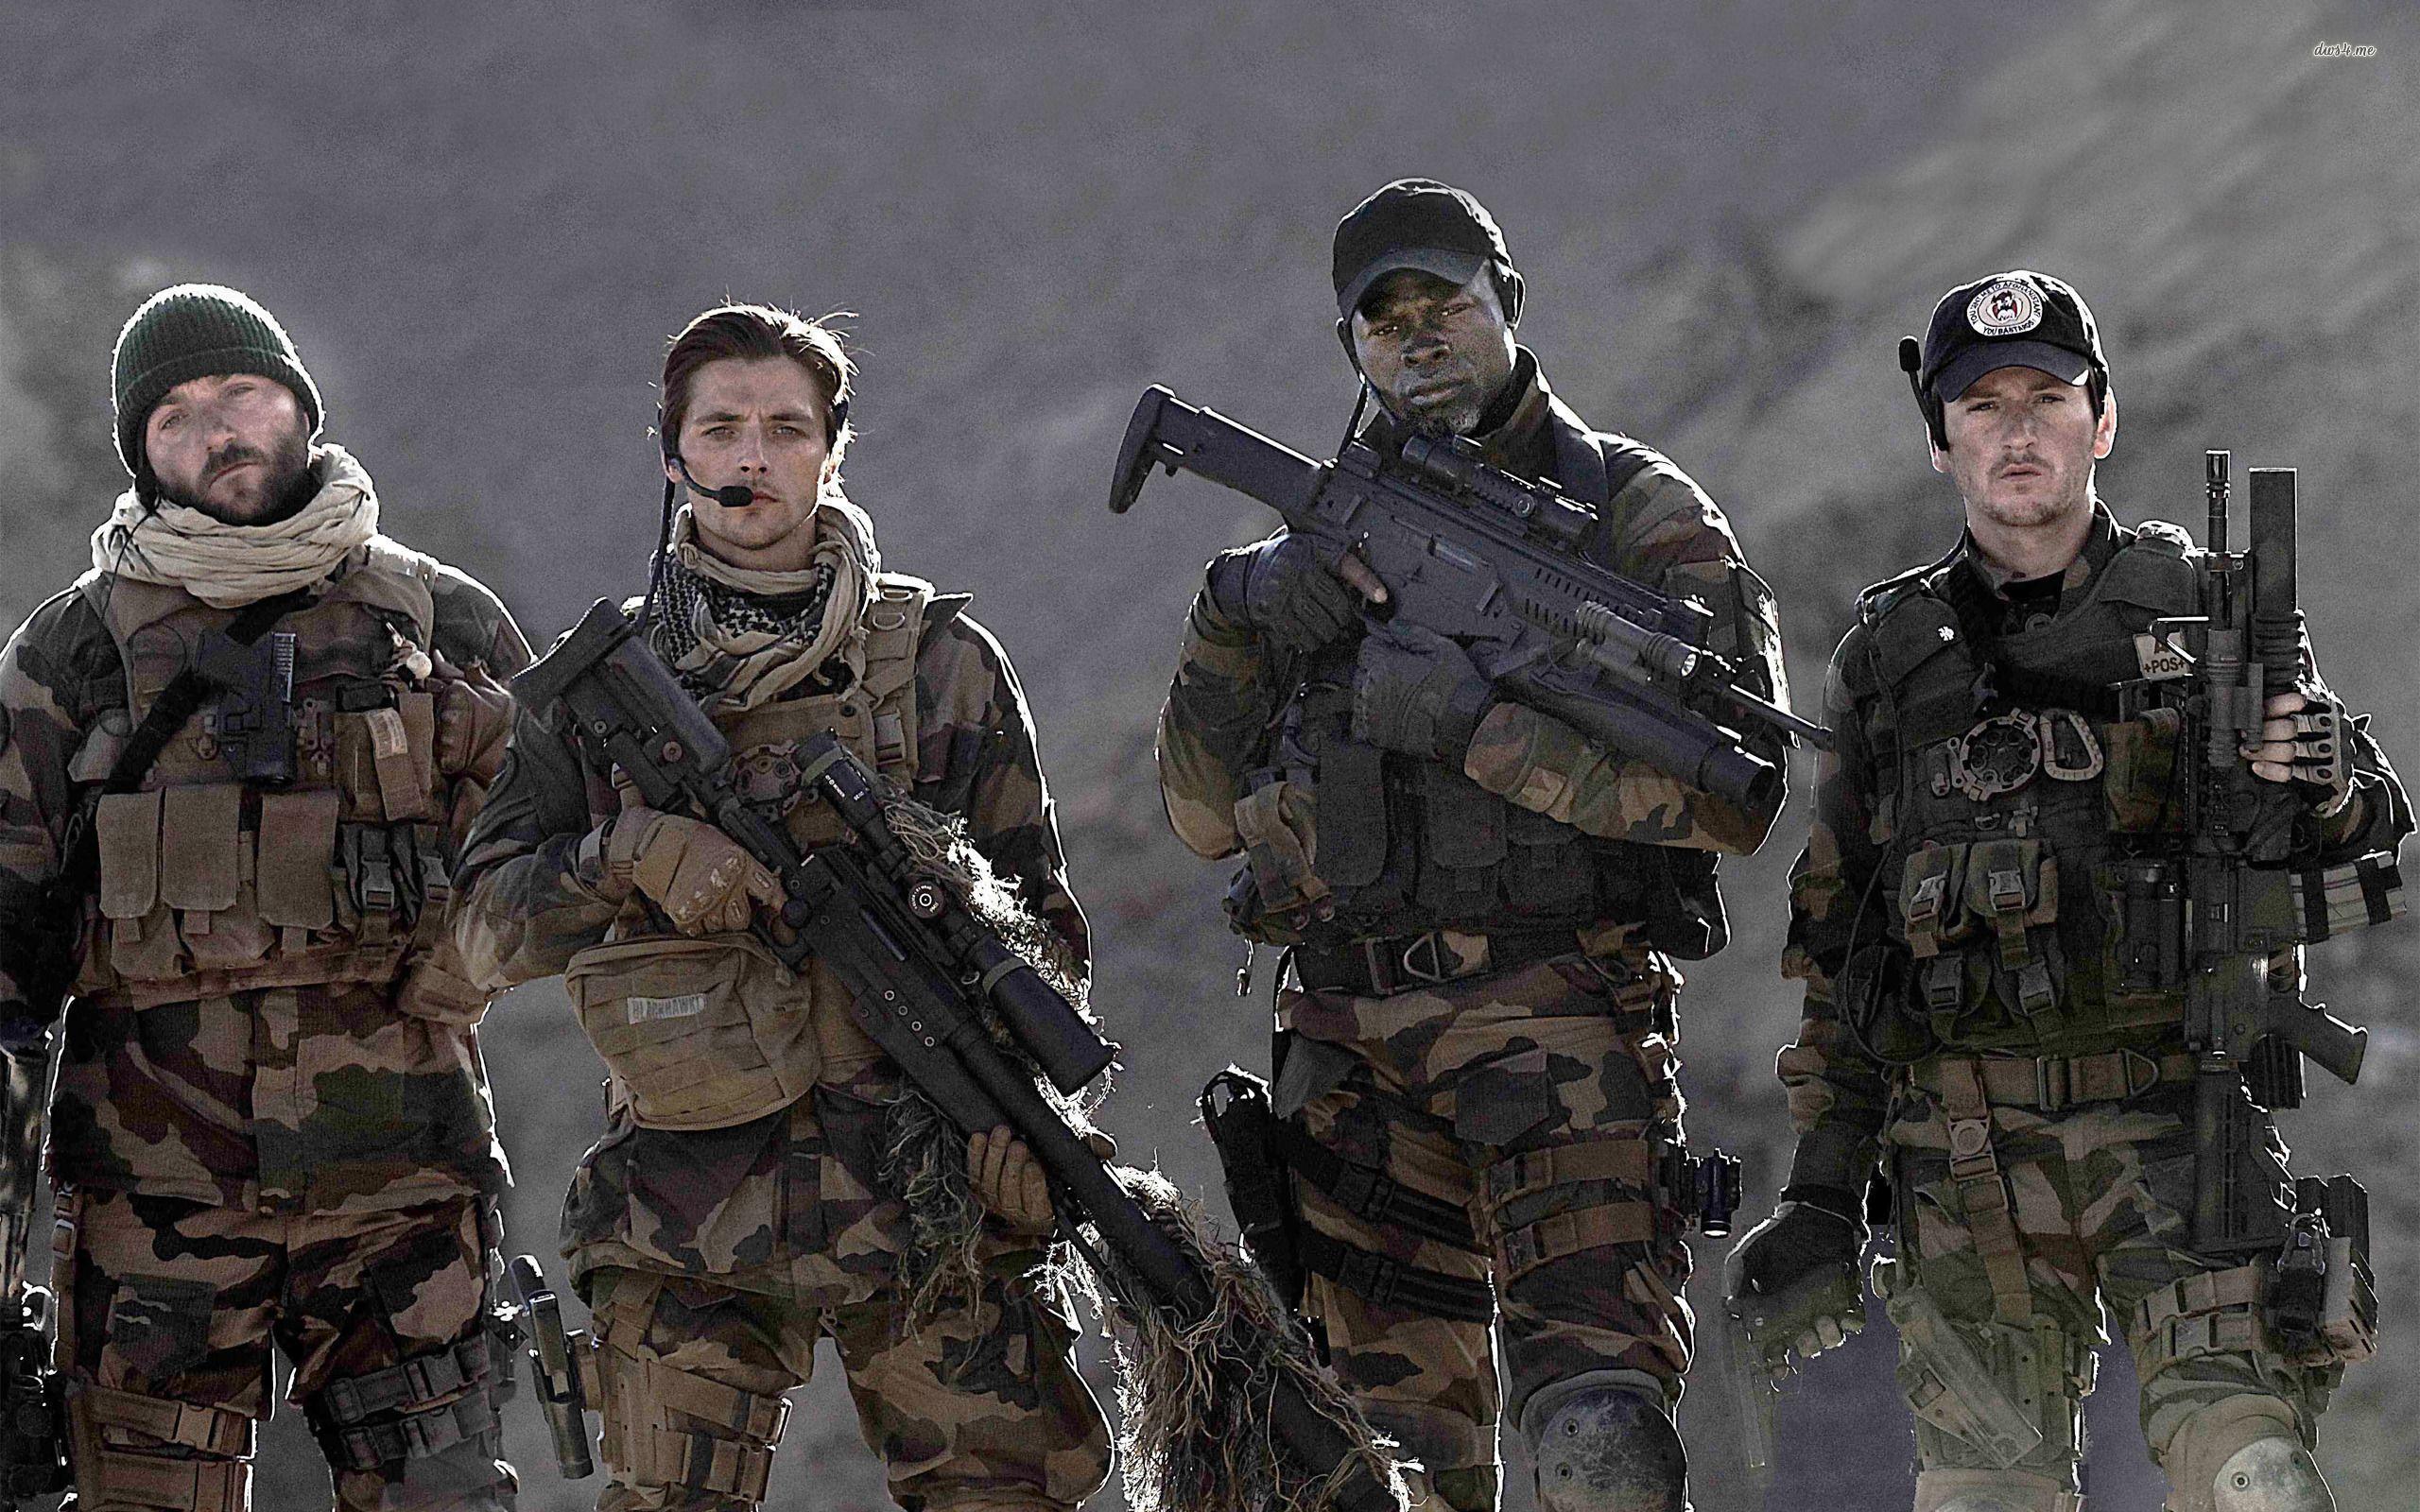 FORCES SPECIAL TÉLÉCHARGER SOCOM